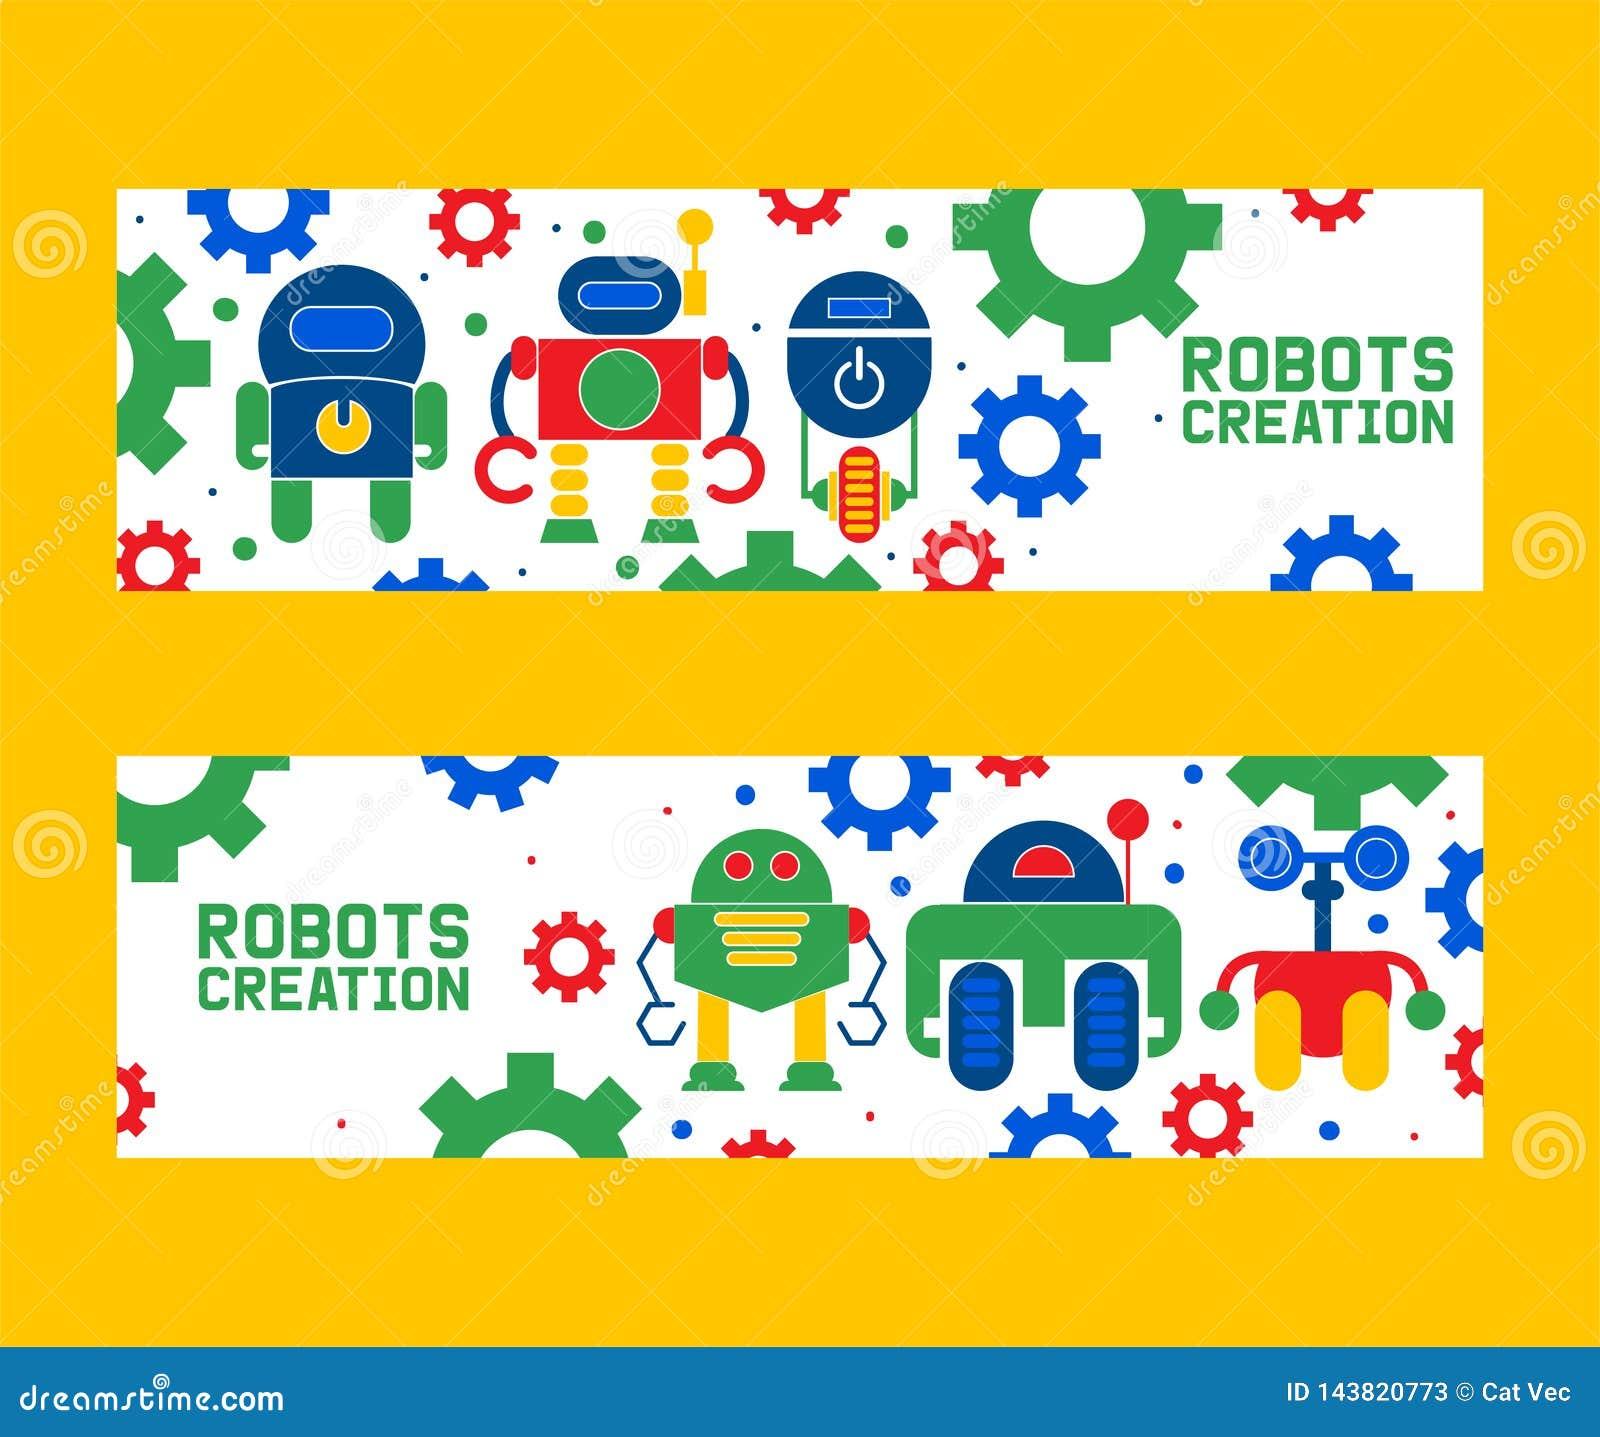 Robotics creation icons set of banners vector illustration. Celebration. Futuristic artificial intelligence technology